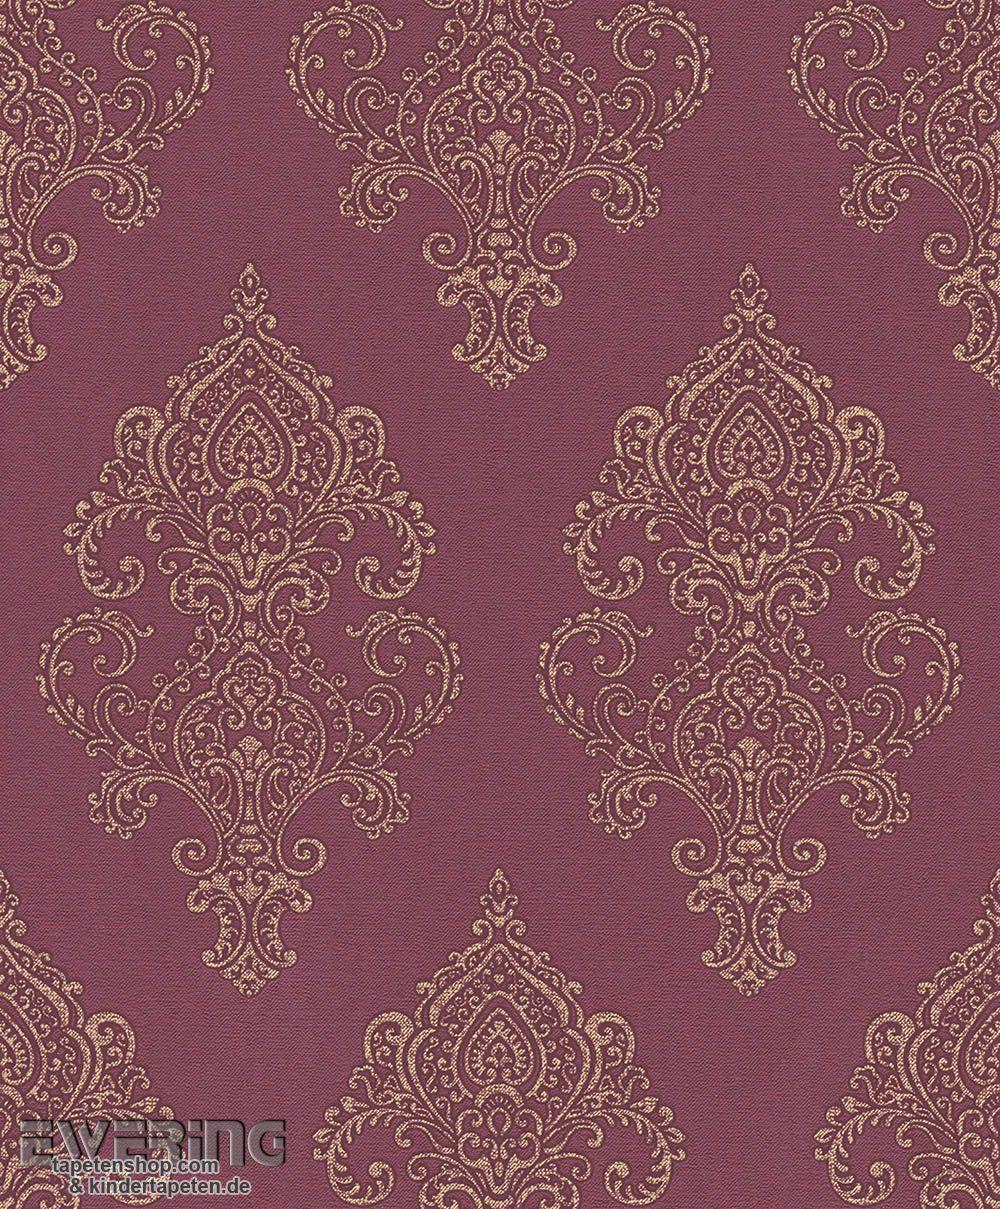 vliestapeten wohnzimmer : 23 225845 Amira Rasch Textil Wein Rot Vliestapete Ornament